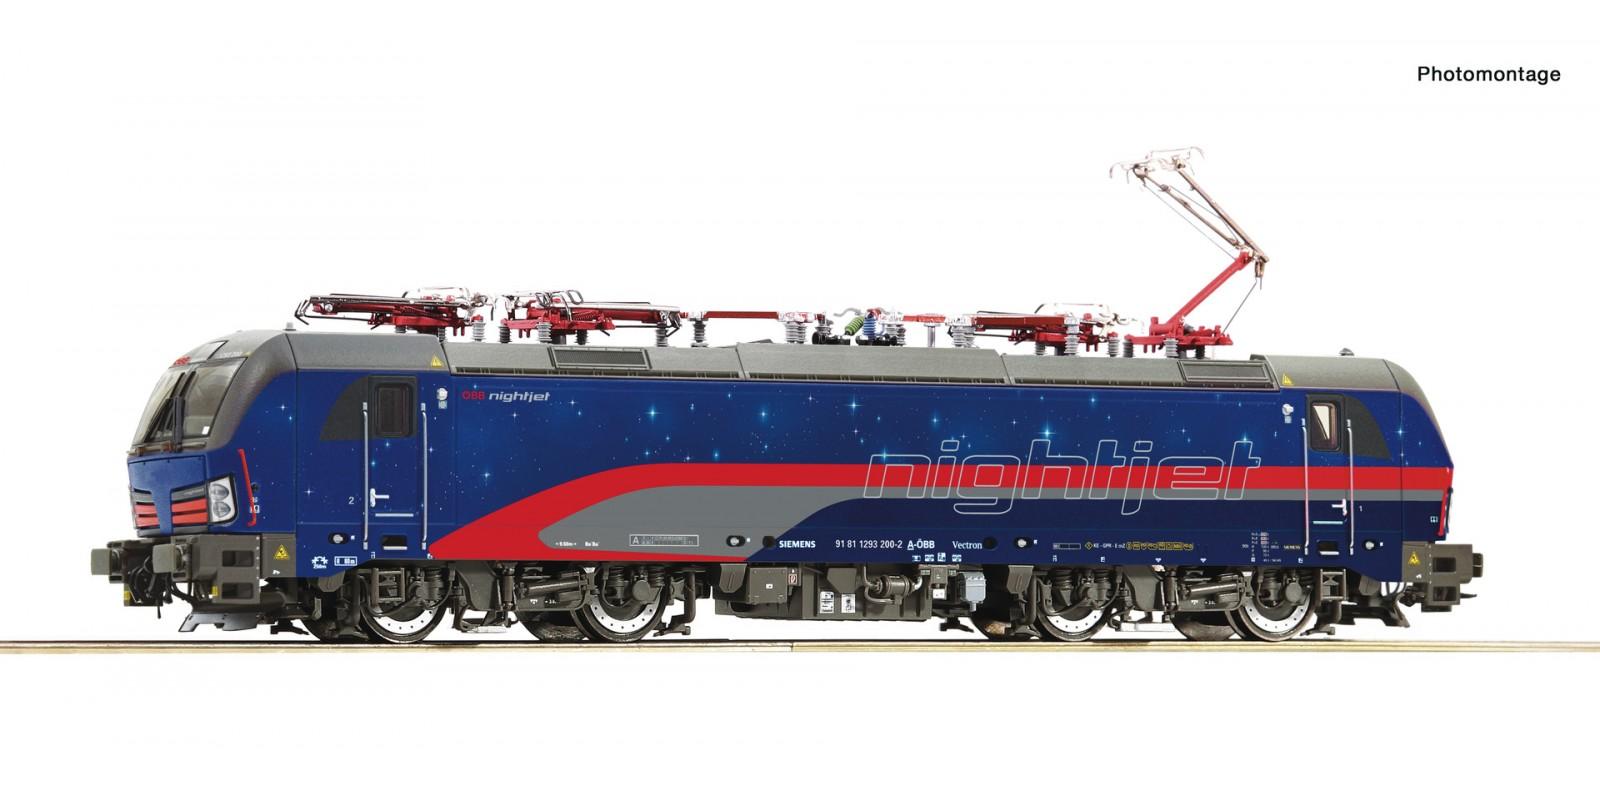 "RO79976 - Electric locomotive 1293 200-2 ""Nightjet"", ÖBB"